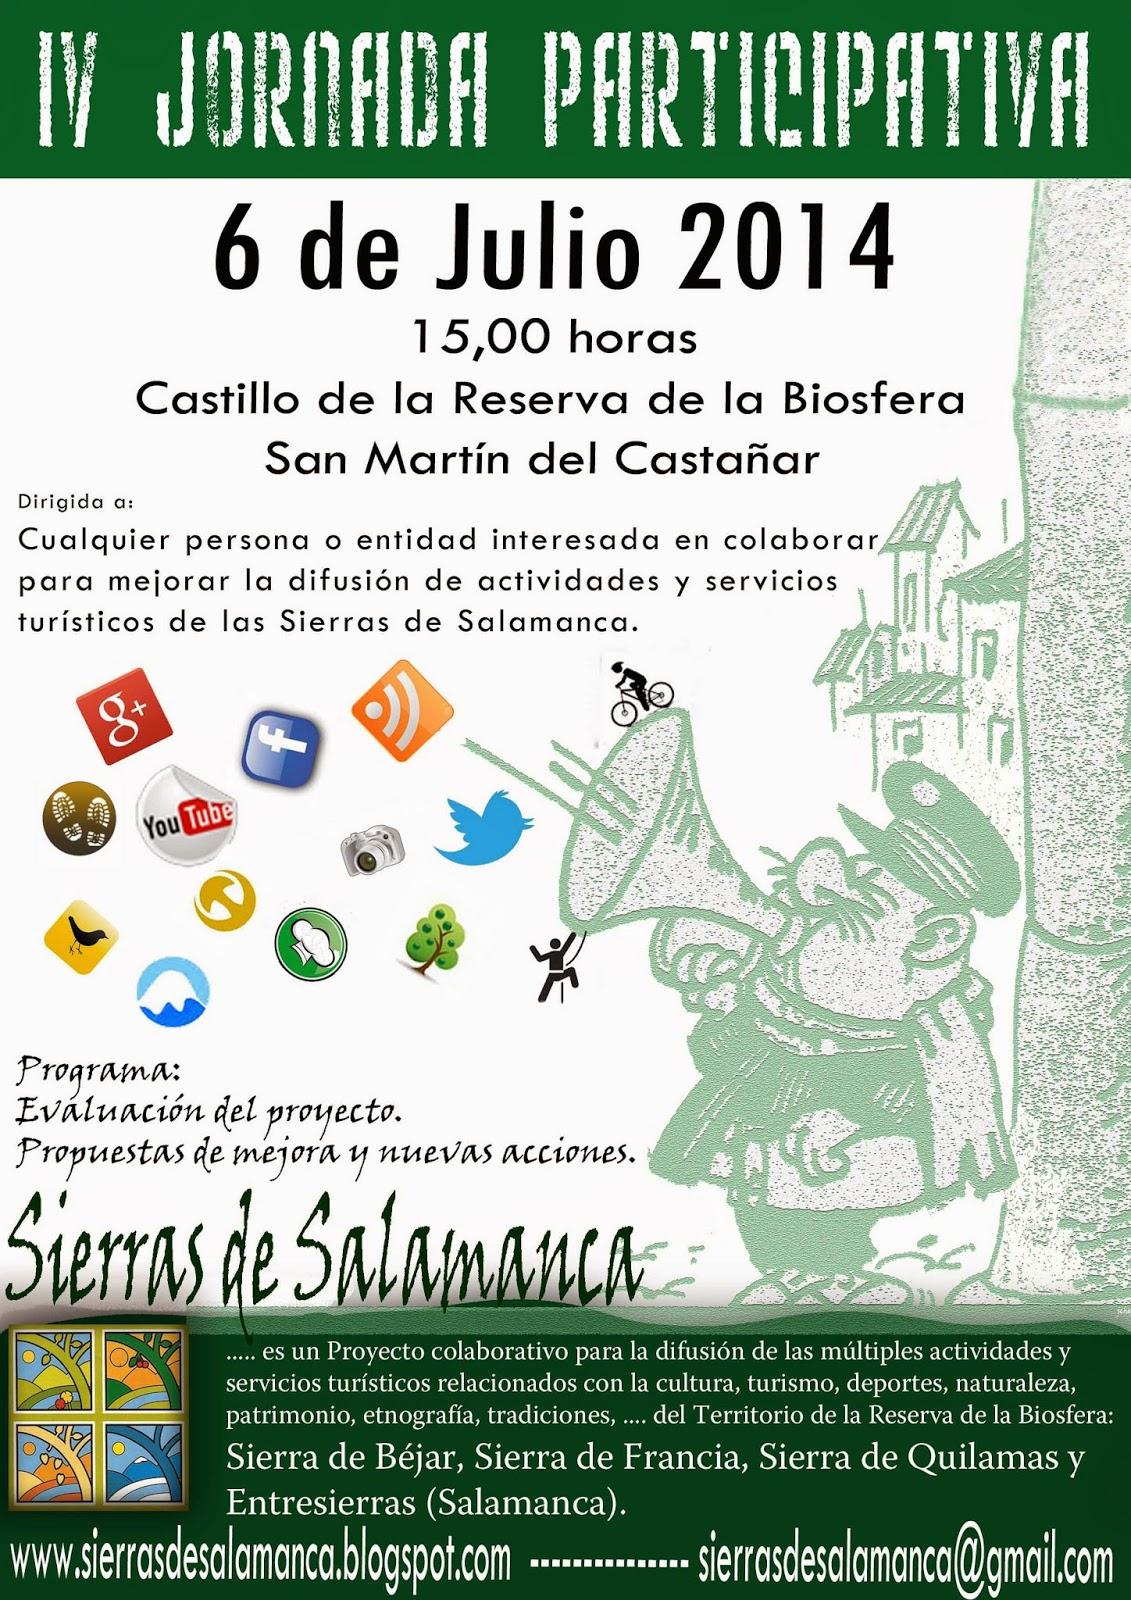 http://sierrasdesalamanca.blogspot.com.es/2014/07/6julio-iv-jornada-participativa-sierras.html